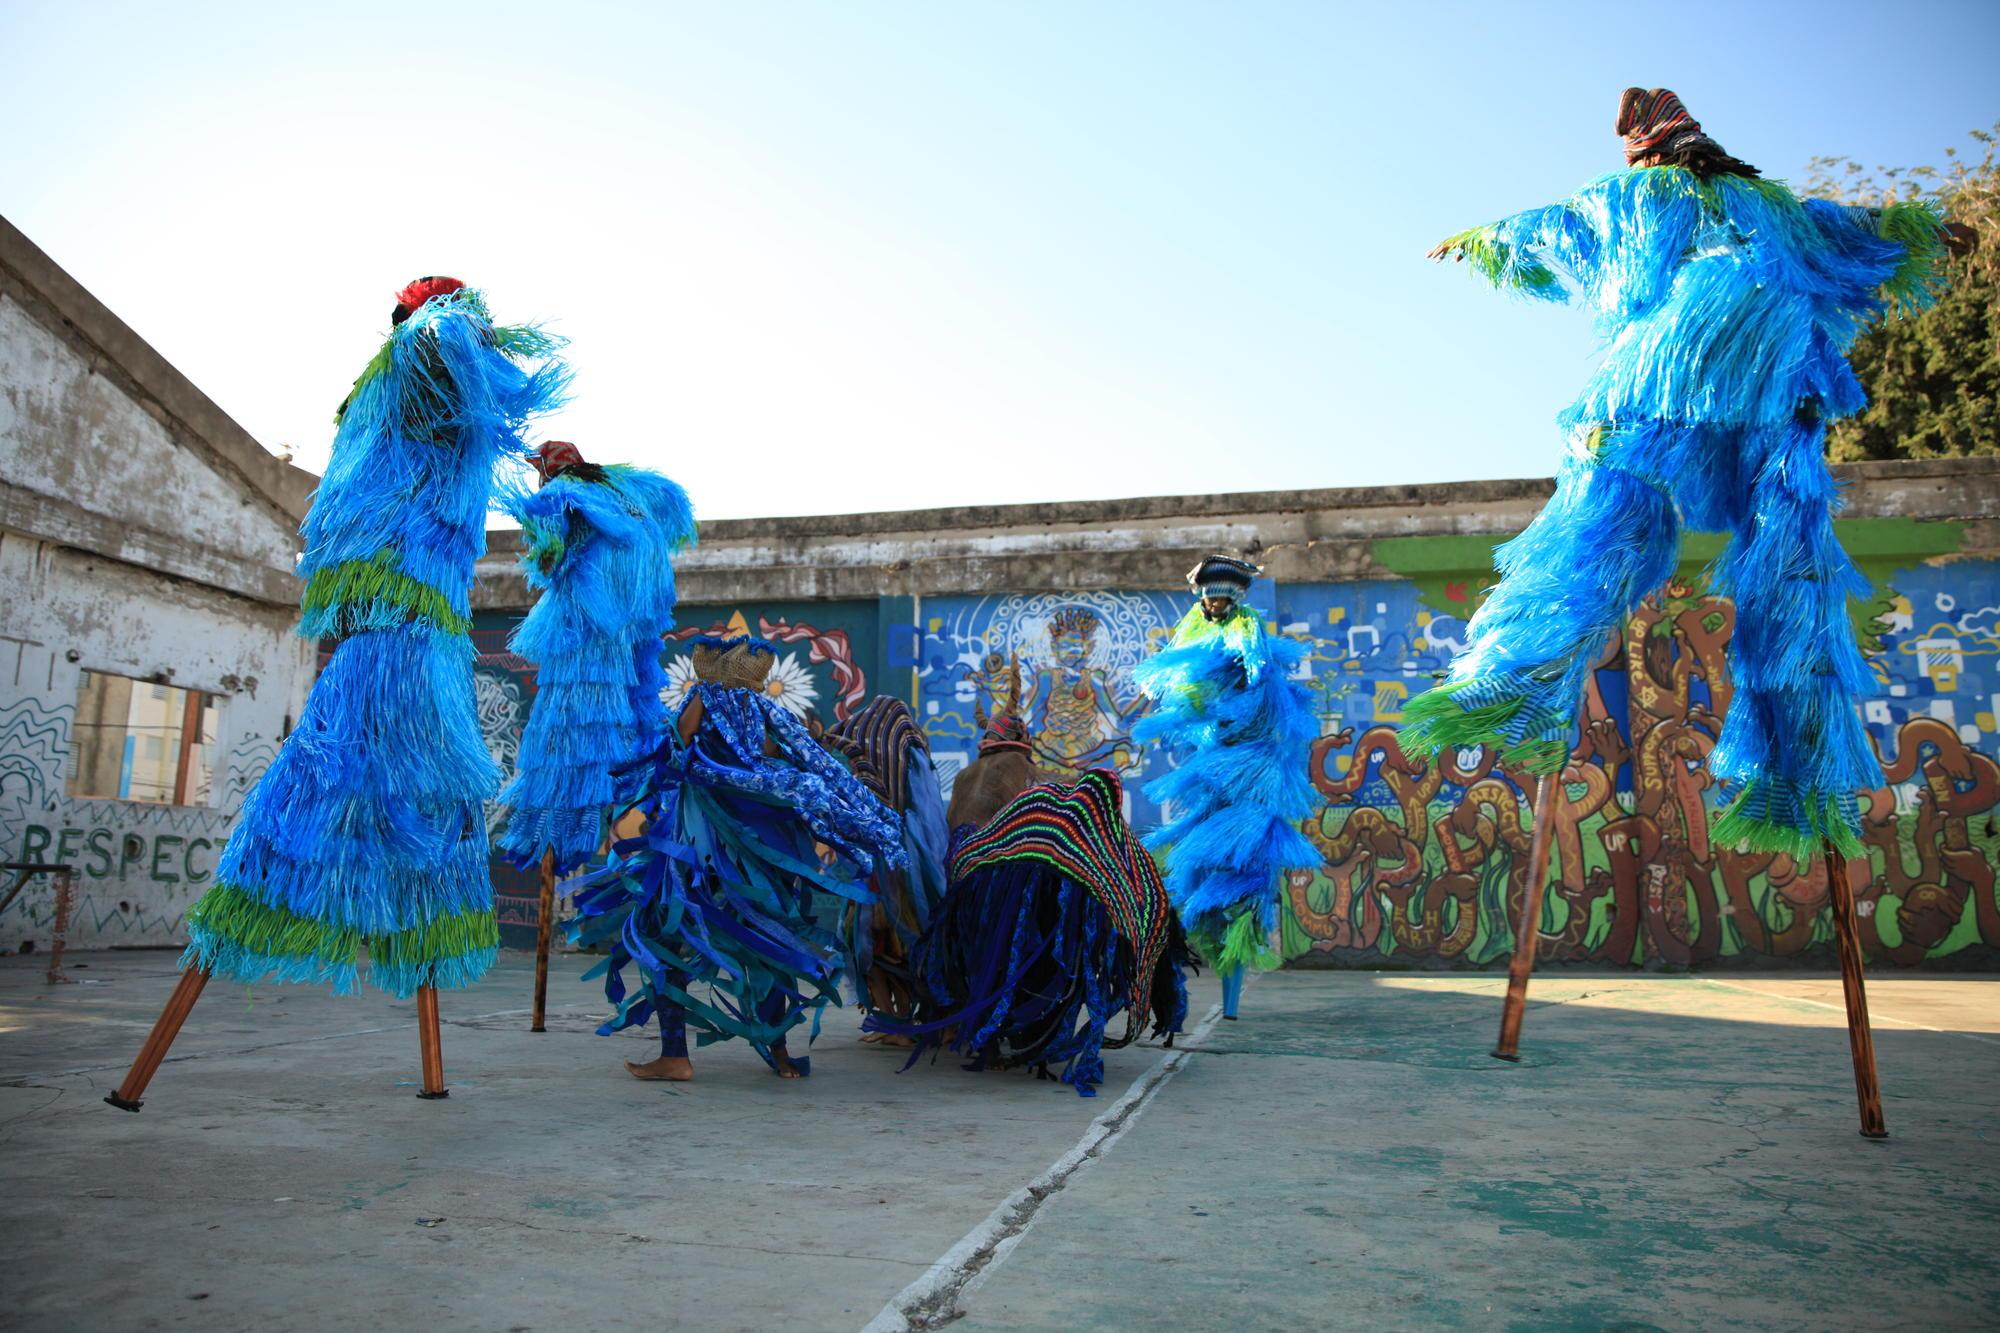 """Jumbies Street Performance"" in Jamaica. Thyssen Bornemisza Art Contemporary - Academy for Ocean Calling by Laura Anderson Barbata, 2017."